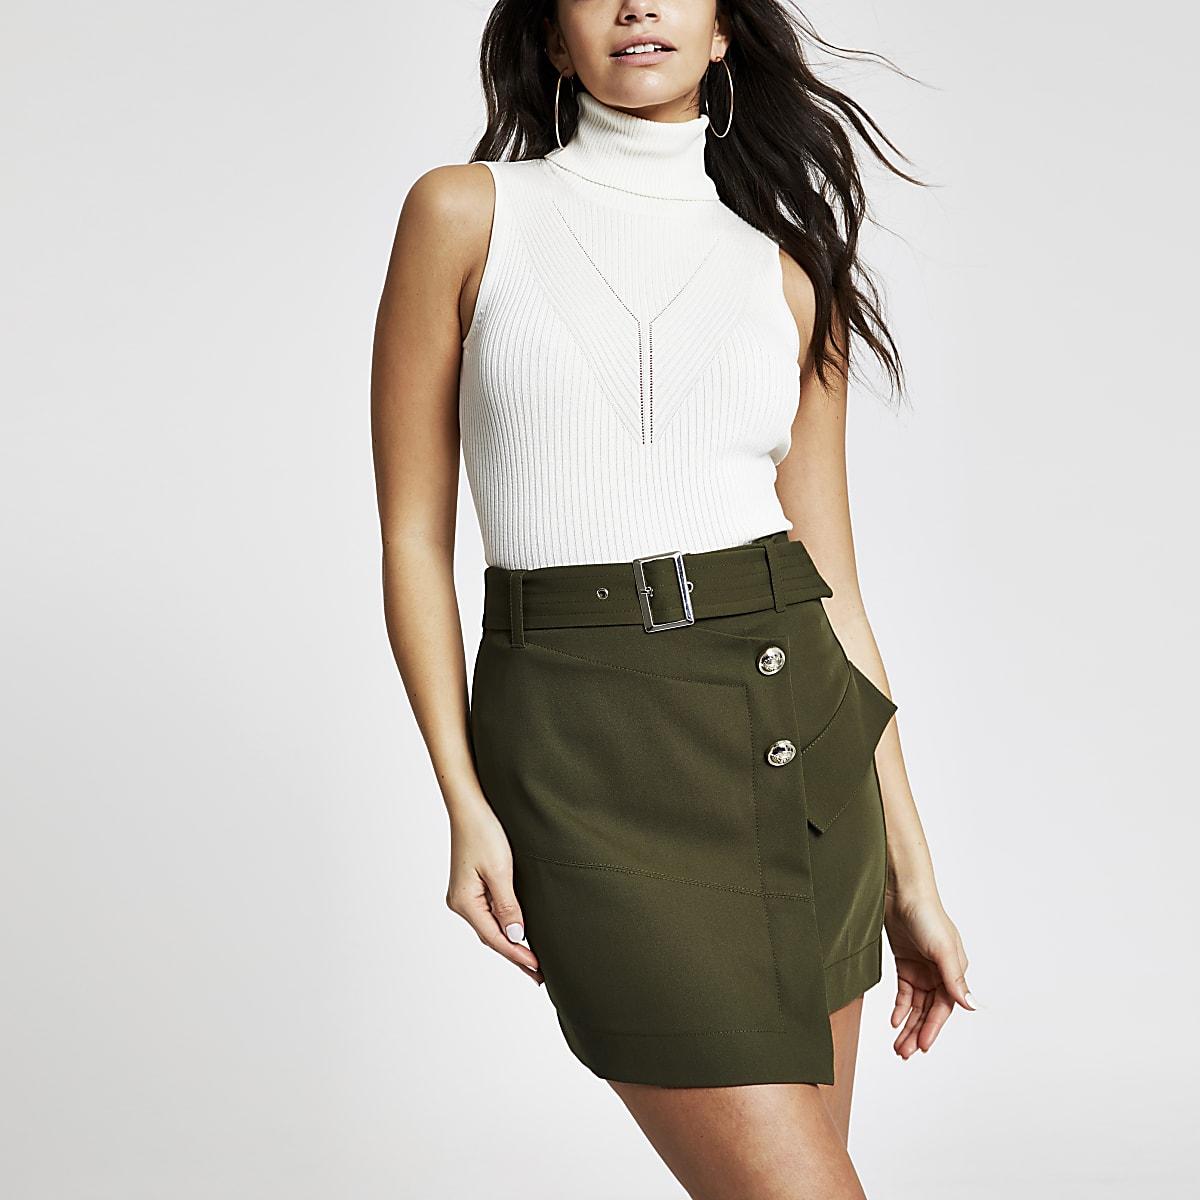 f6dba147dd8439 Khaki utility mini skirt - Mini Skirts - Skirts - women